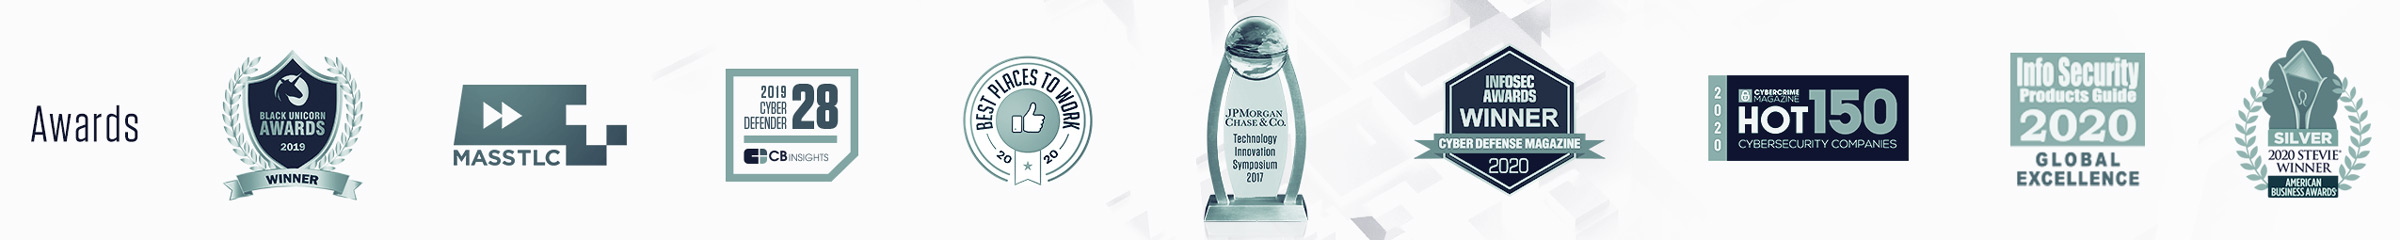 ReversingLabs Awards